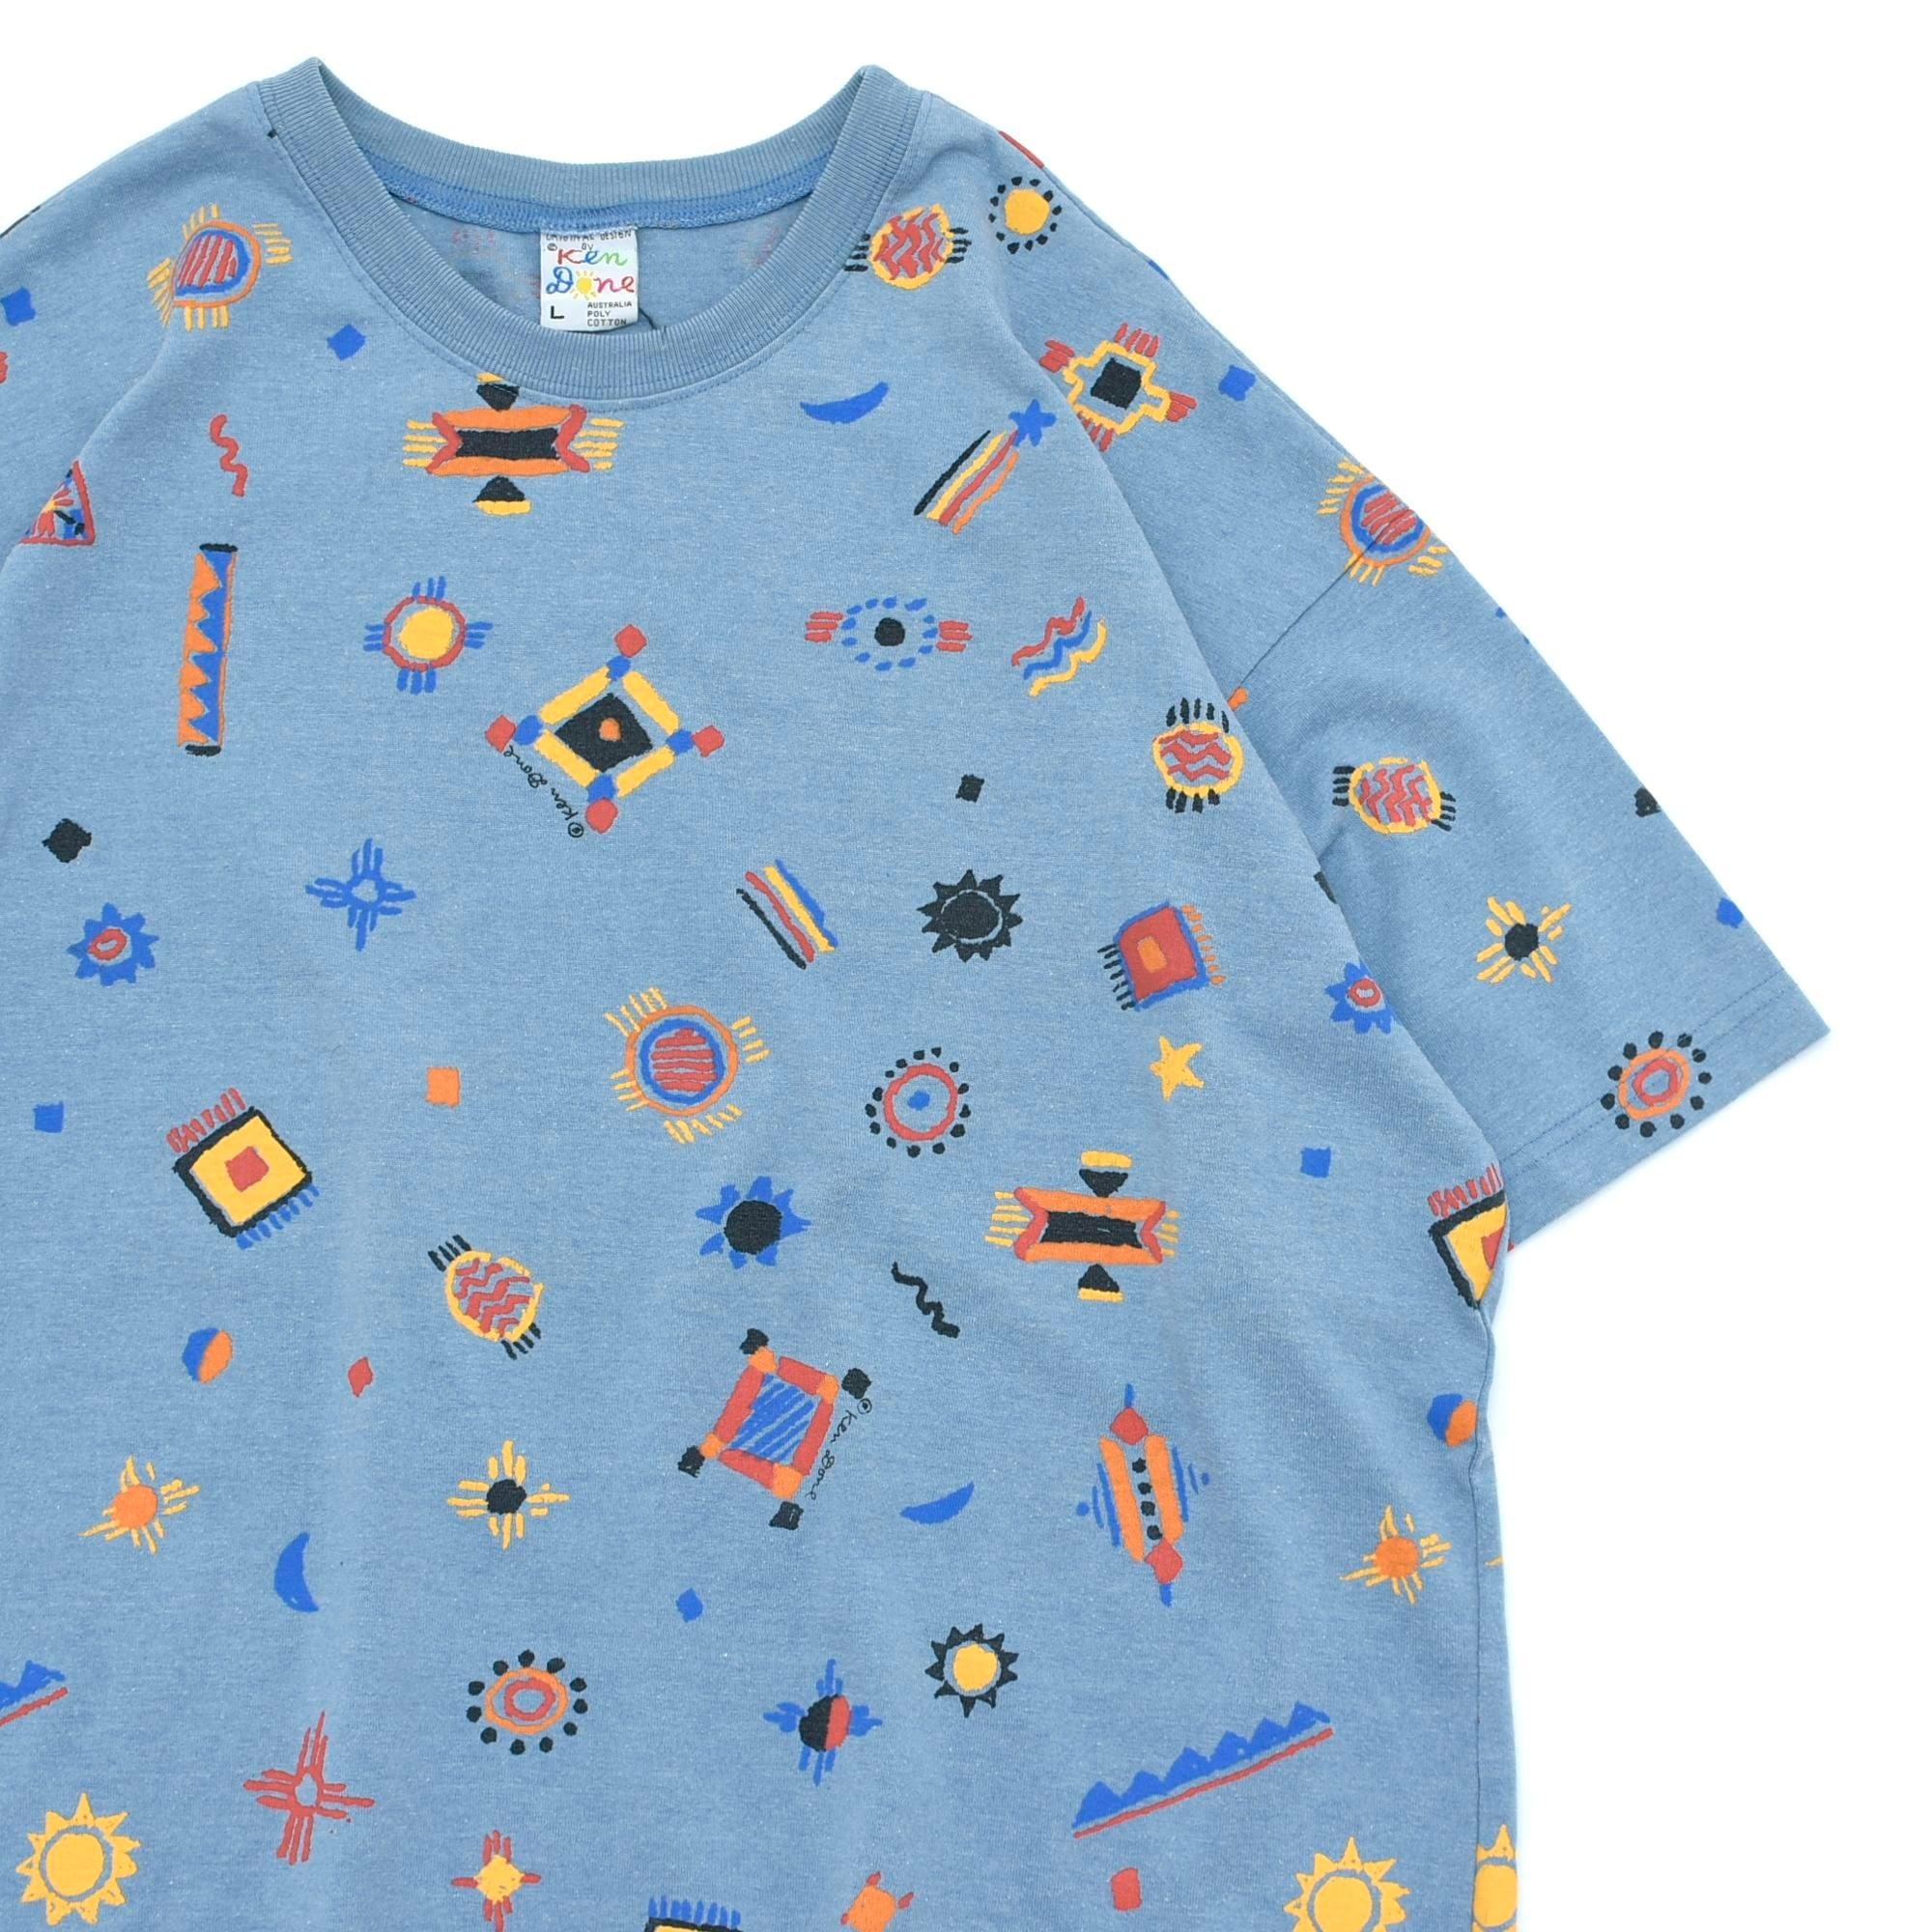 Design by Ken Done full pattarn T-shirt Made in Australia